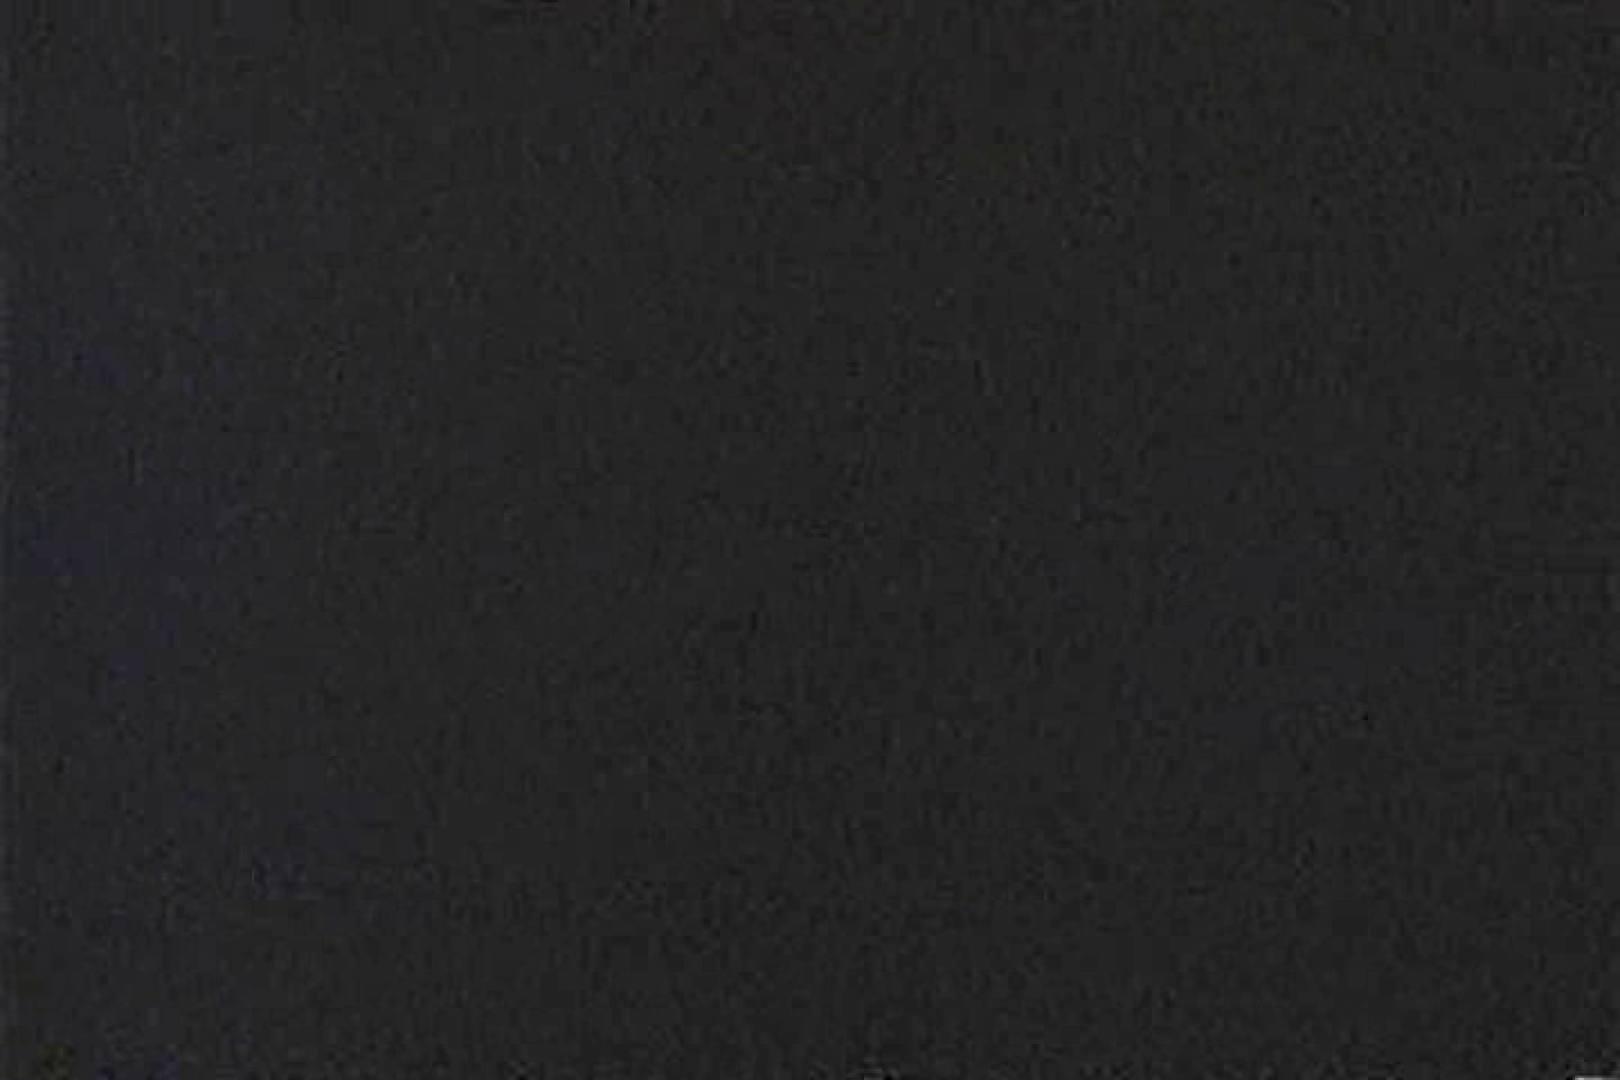 MASAさんの待ち伏せ撮り! 赤外線カーセックスVol.17 セックス AV無料動画キャプチャ 70pic 22